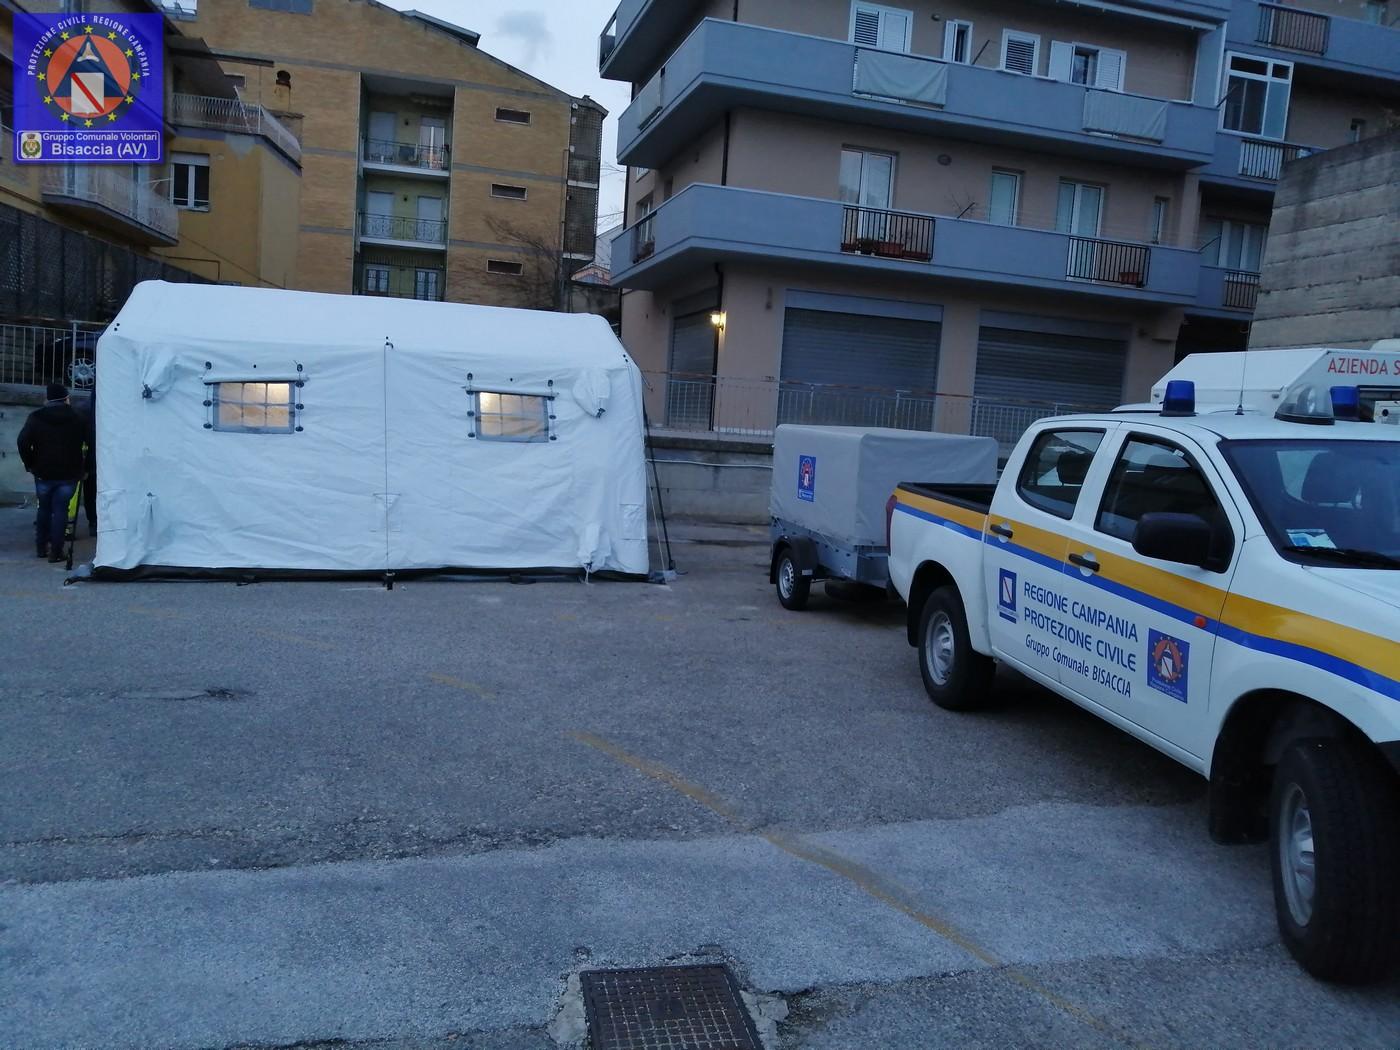 Tenda Ariano GCVPC Bisaccia 5